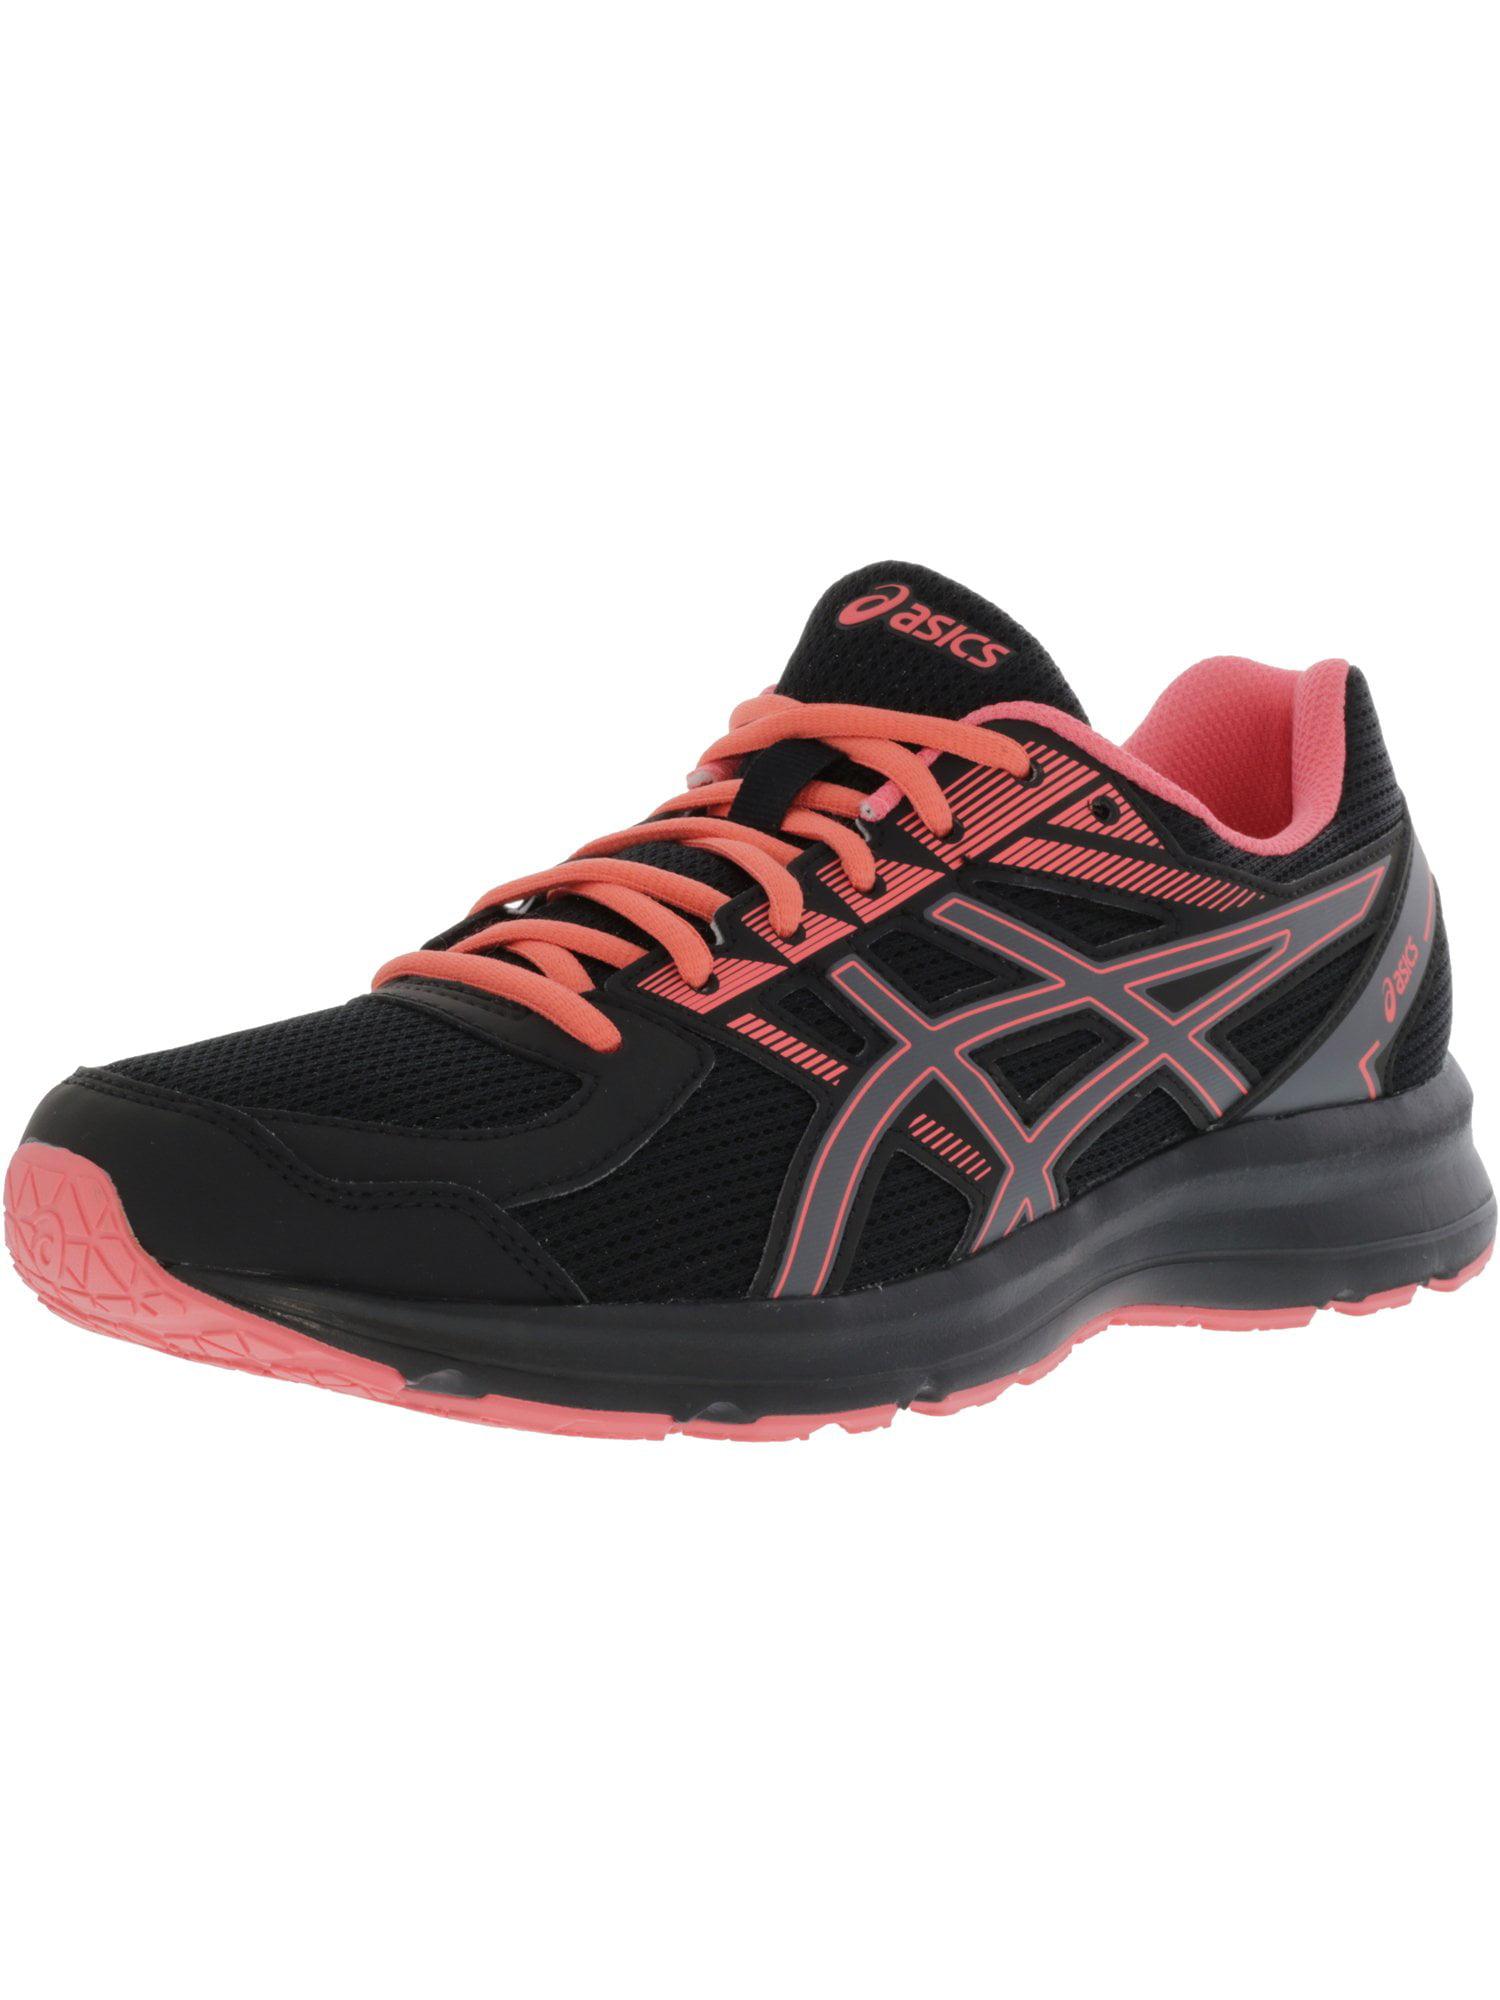 Asics Women's Jolt Black / Carbon Peach Ankle-High Running Shoe - 10.5M